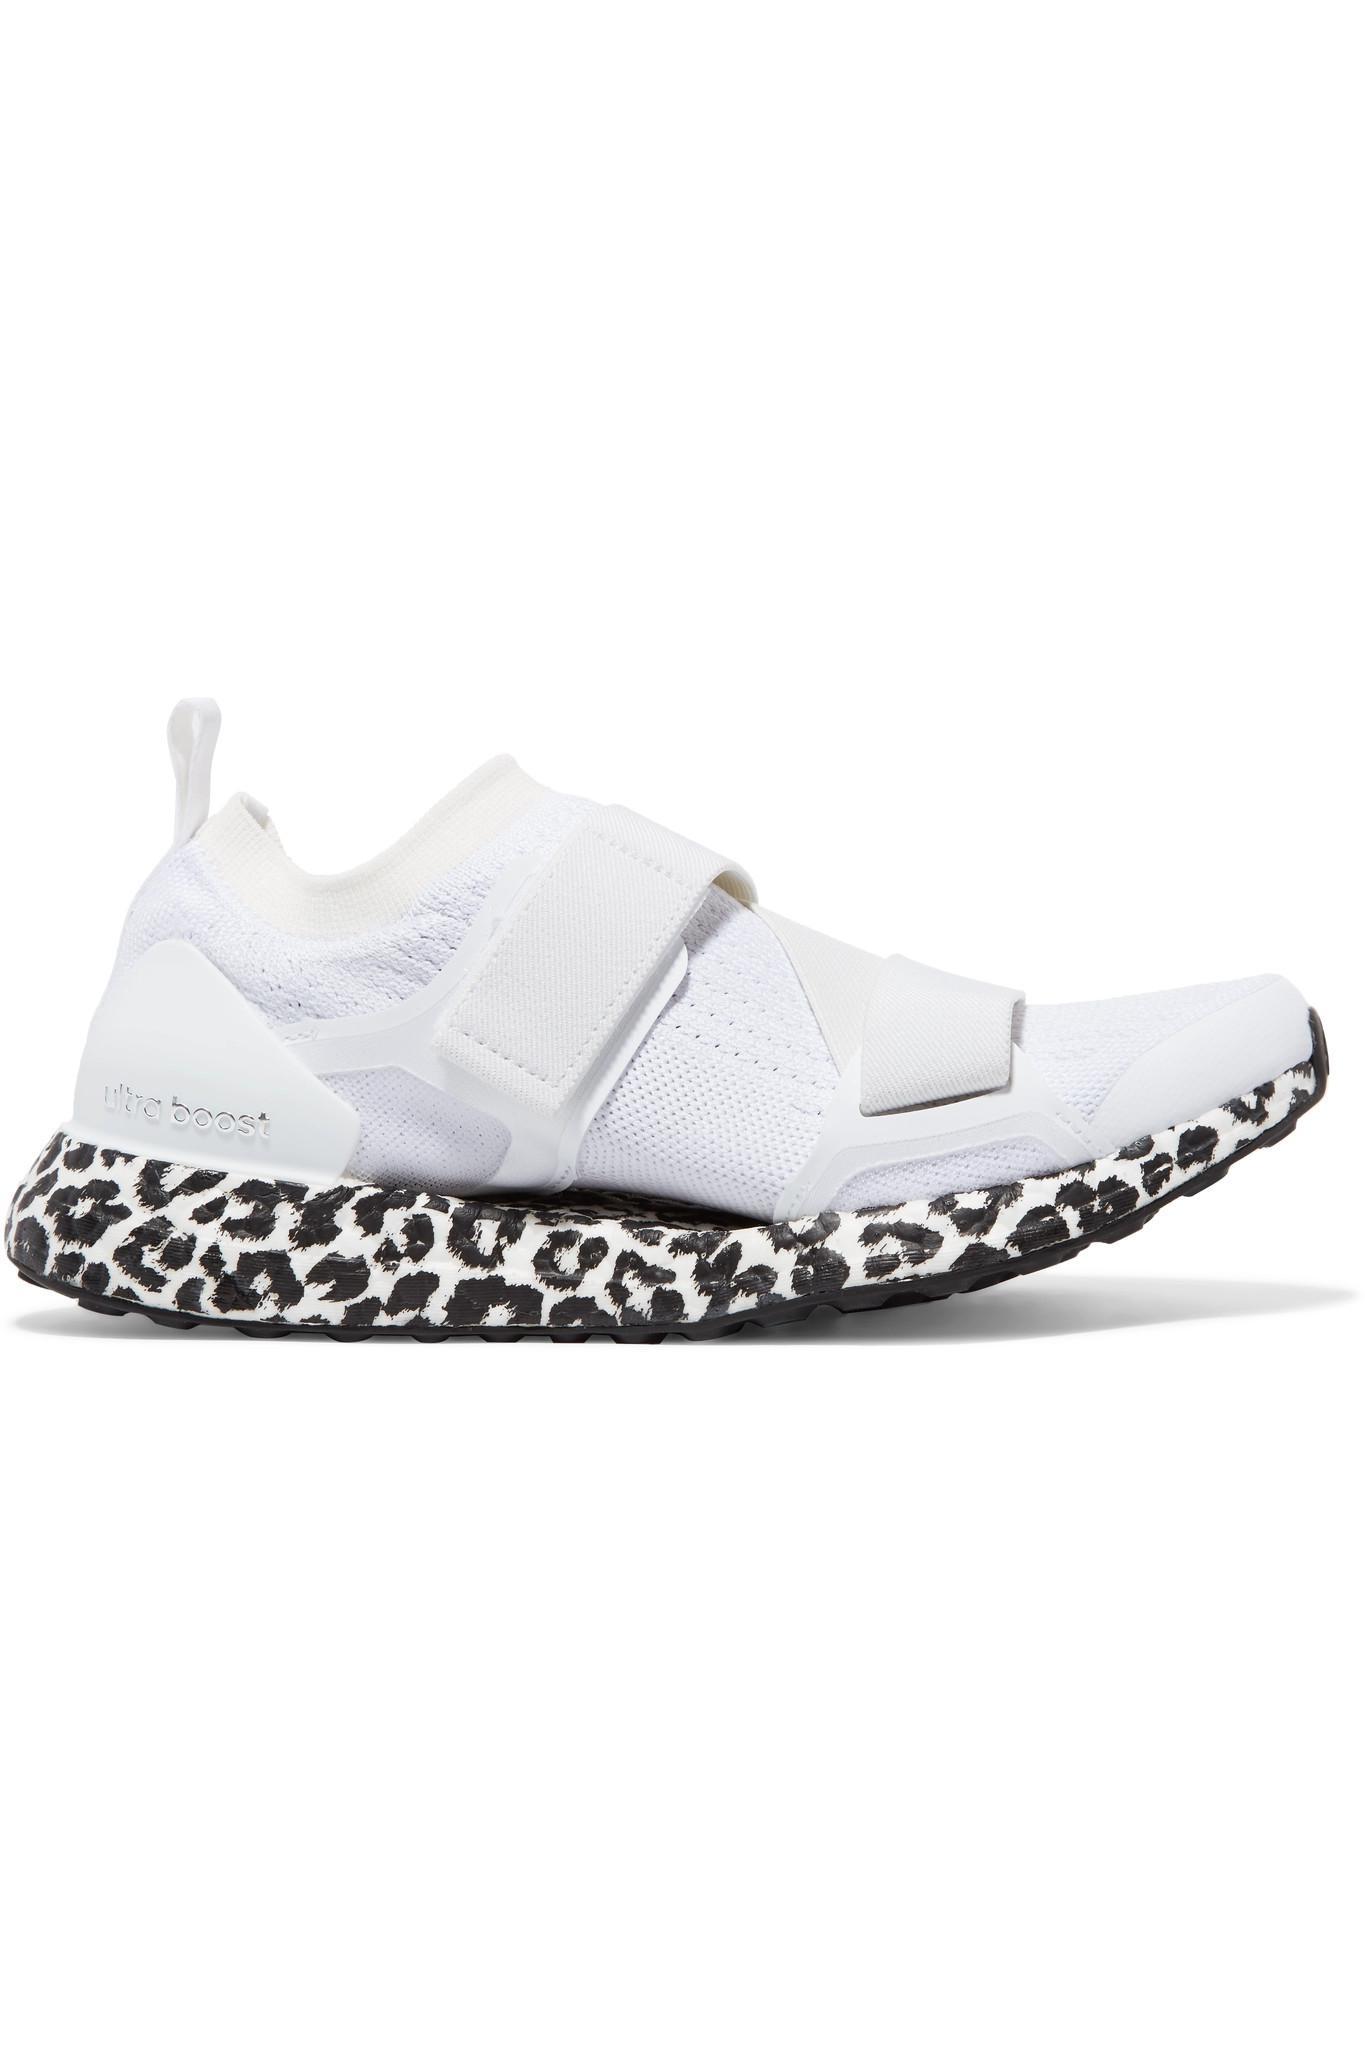 c8eb4606736bd adidas By Stella McCartney. Women s White Ultraboost X Primeknit Trainers